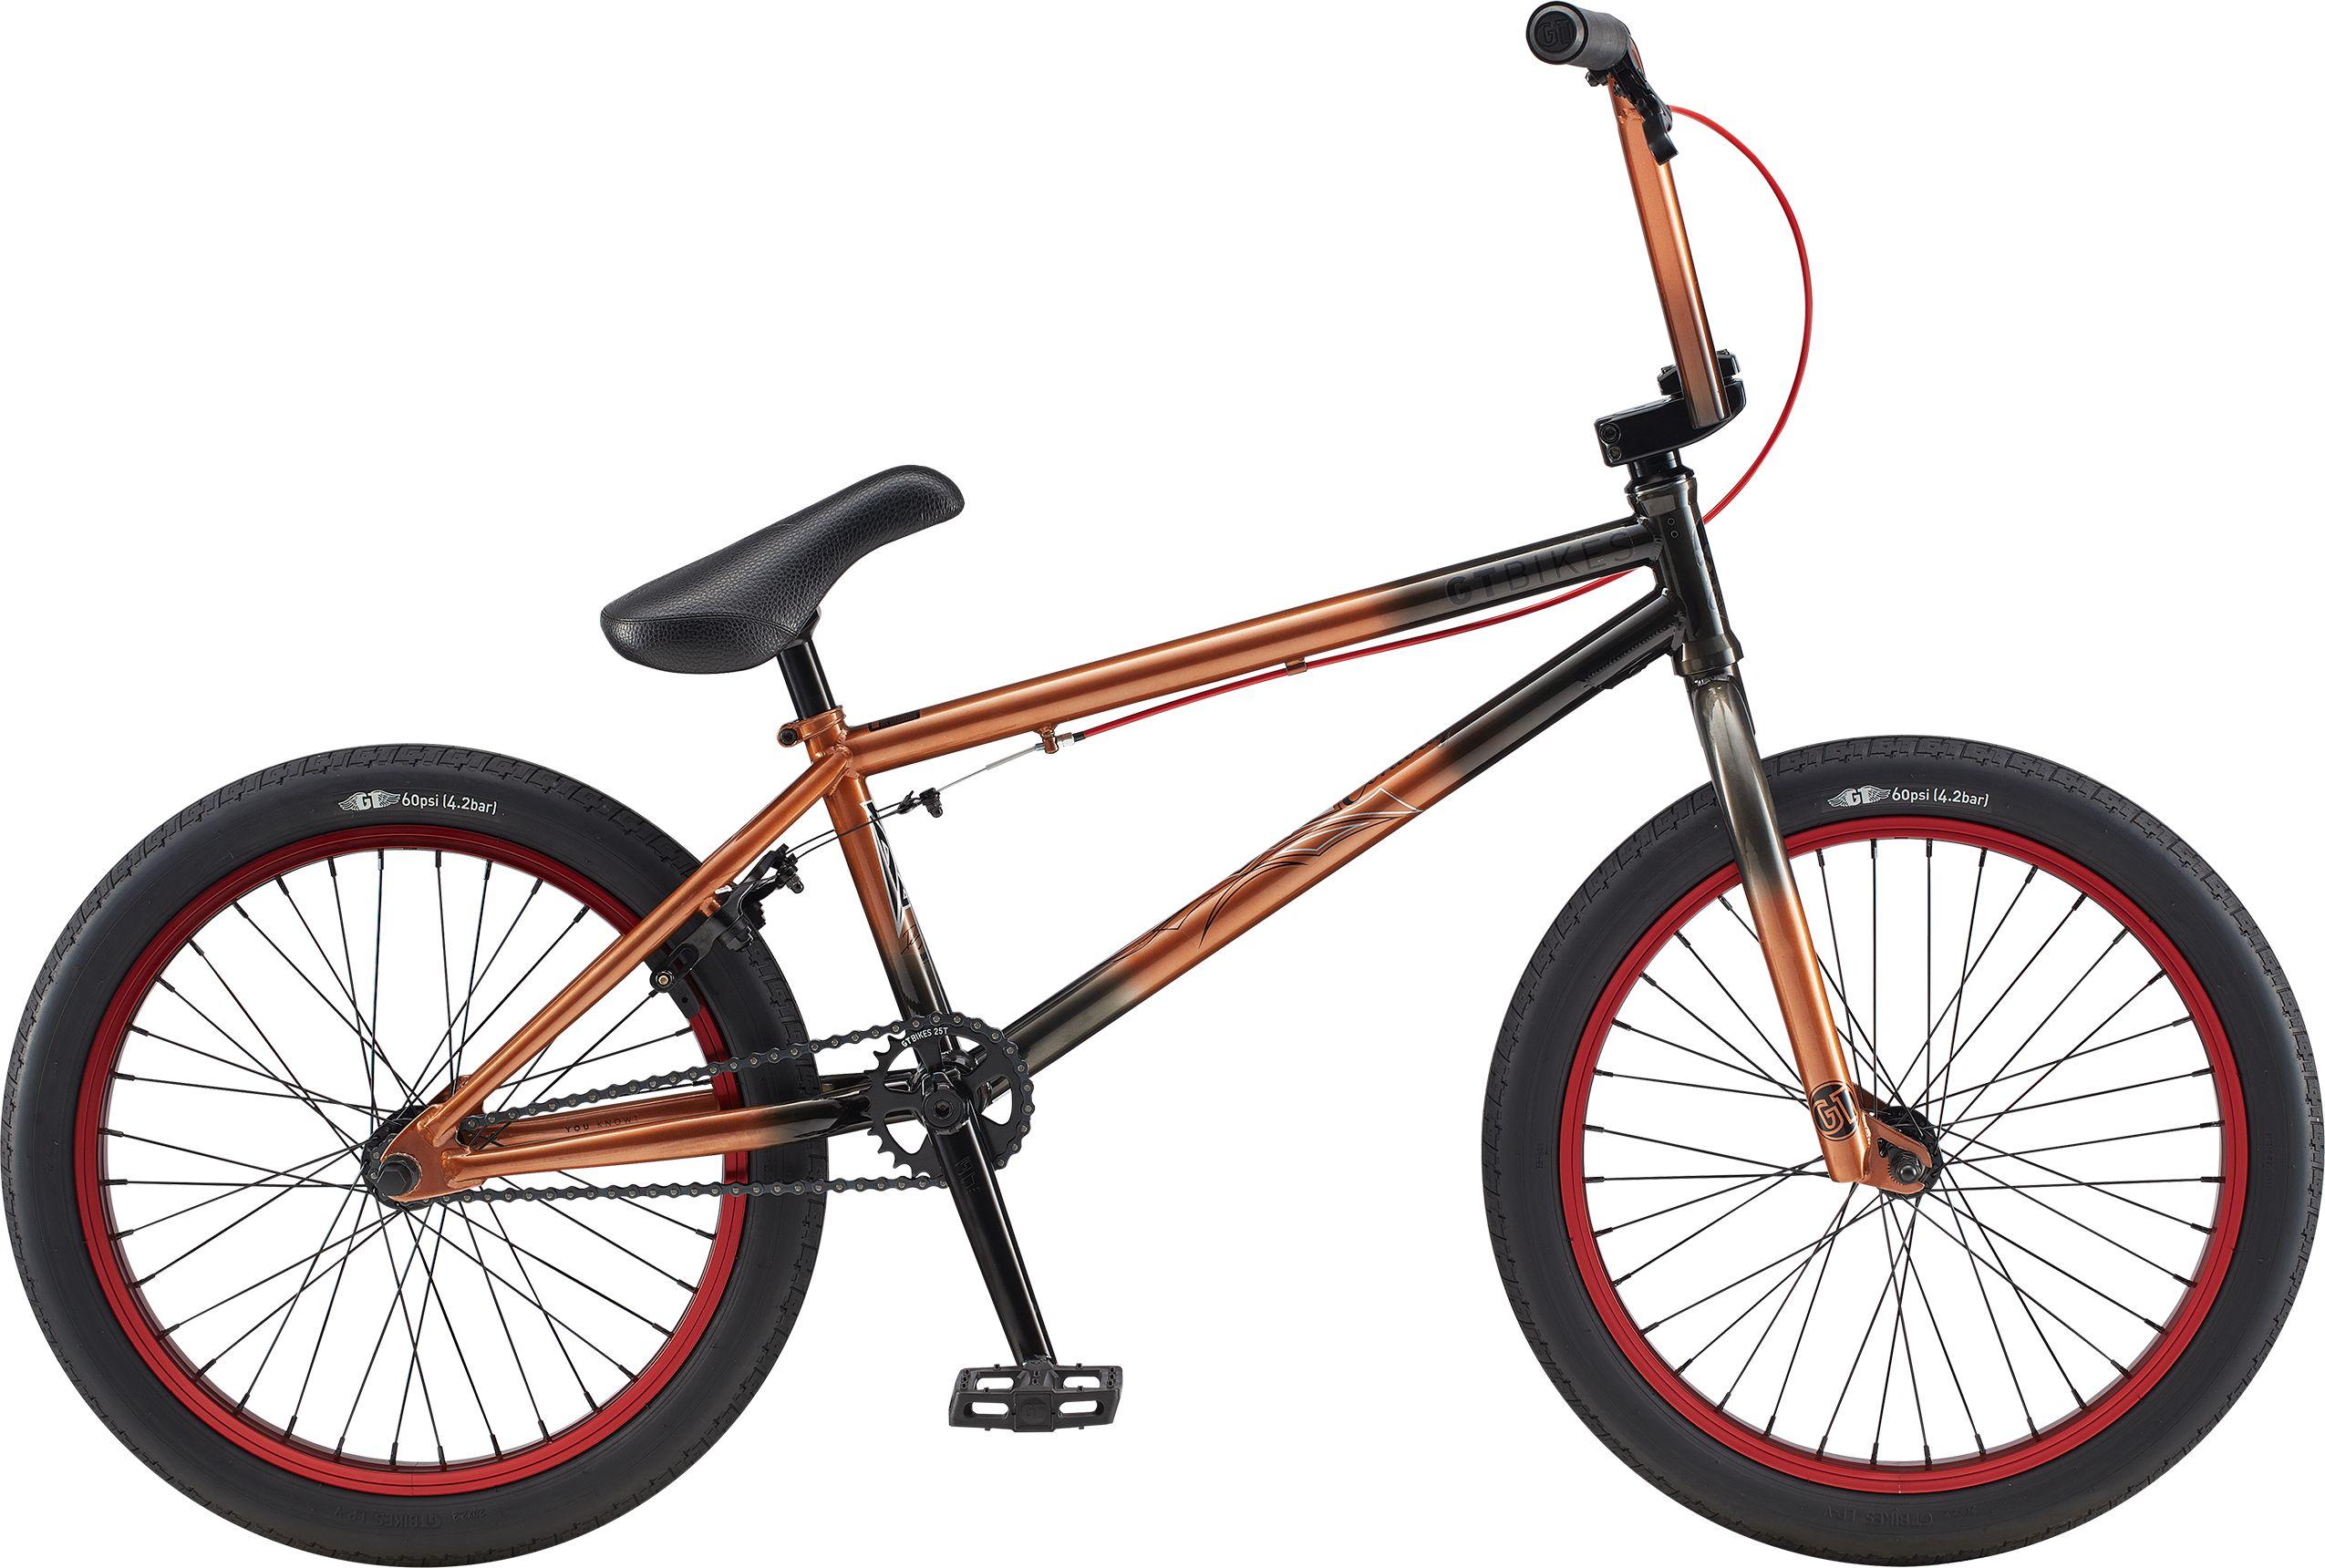 Gt Conway Team Replica Bmx Bike 2020 | BMX